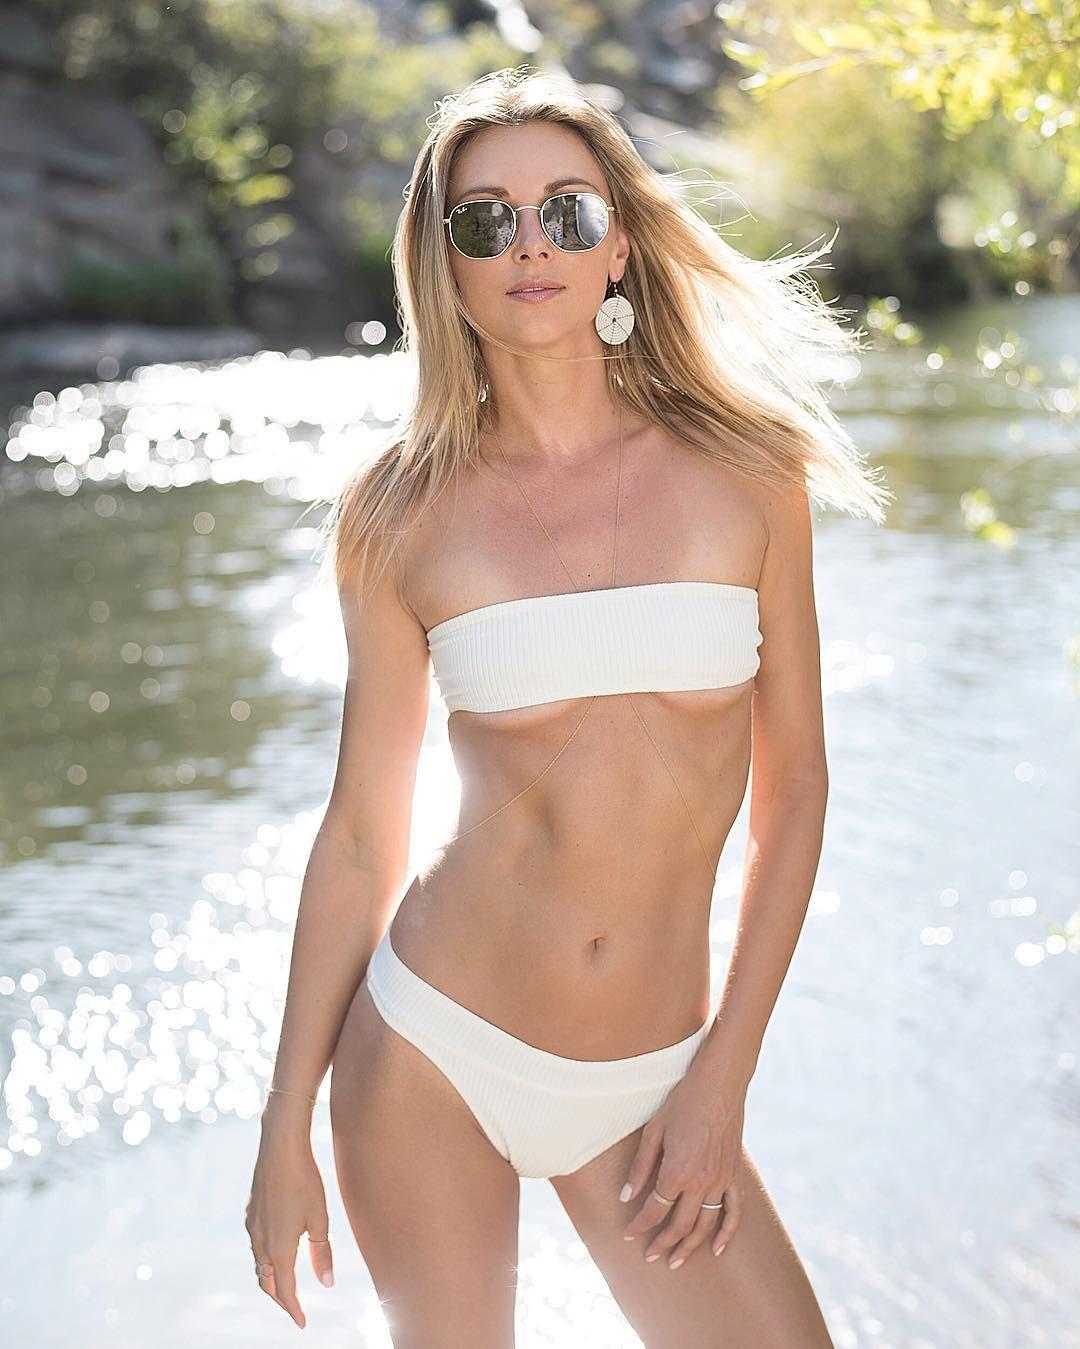 Celebrity Ludi Delfino nudes (16 foto and video), Pussy, Sideboobs, Selfie, in bikini 2017